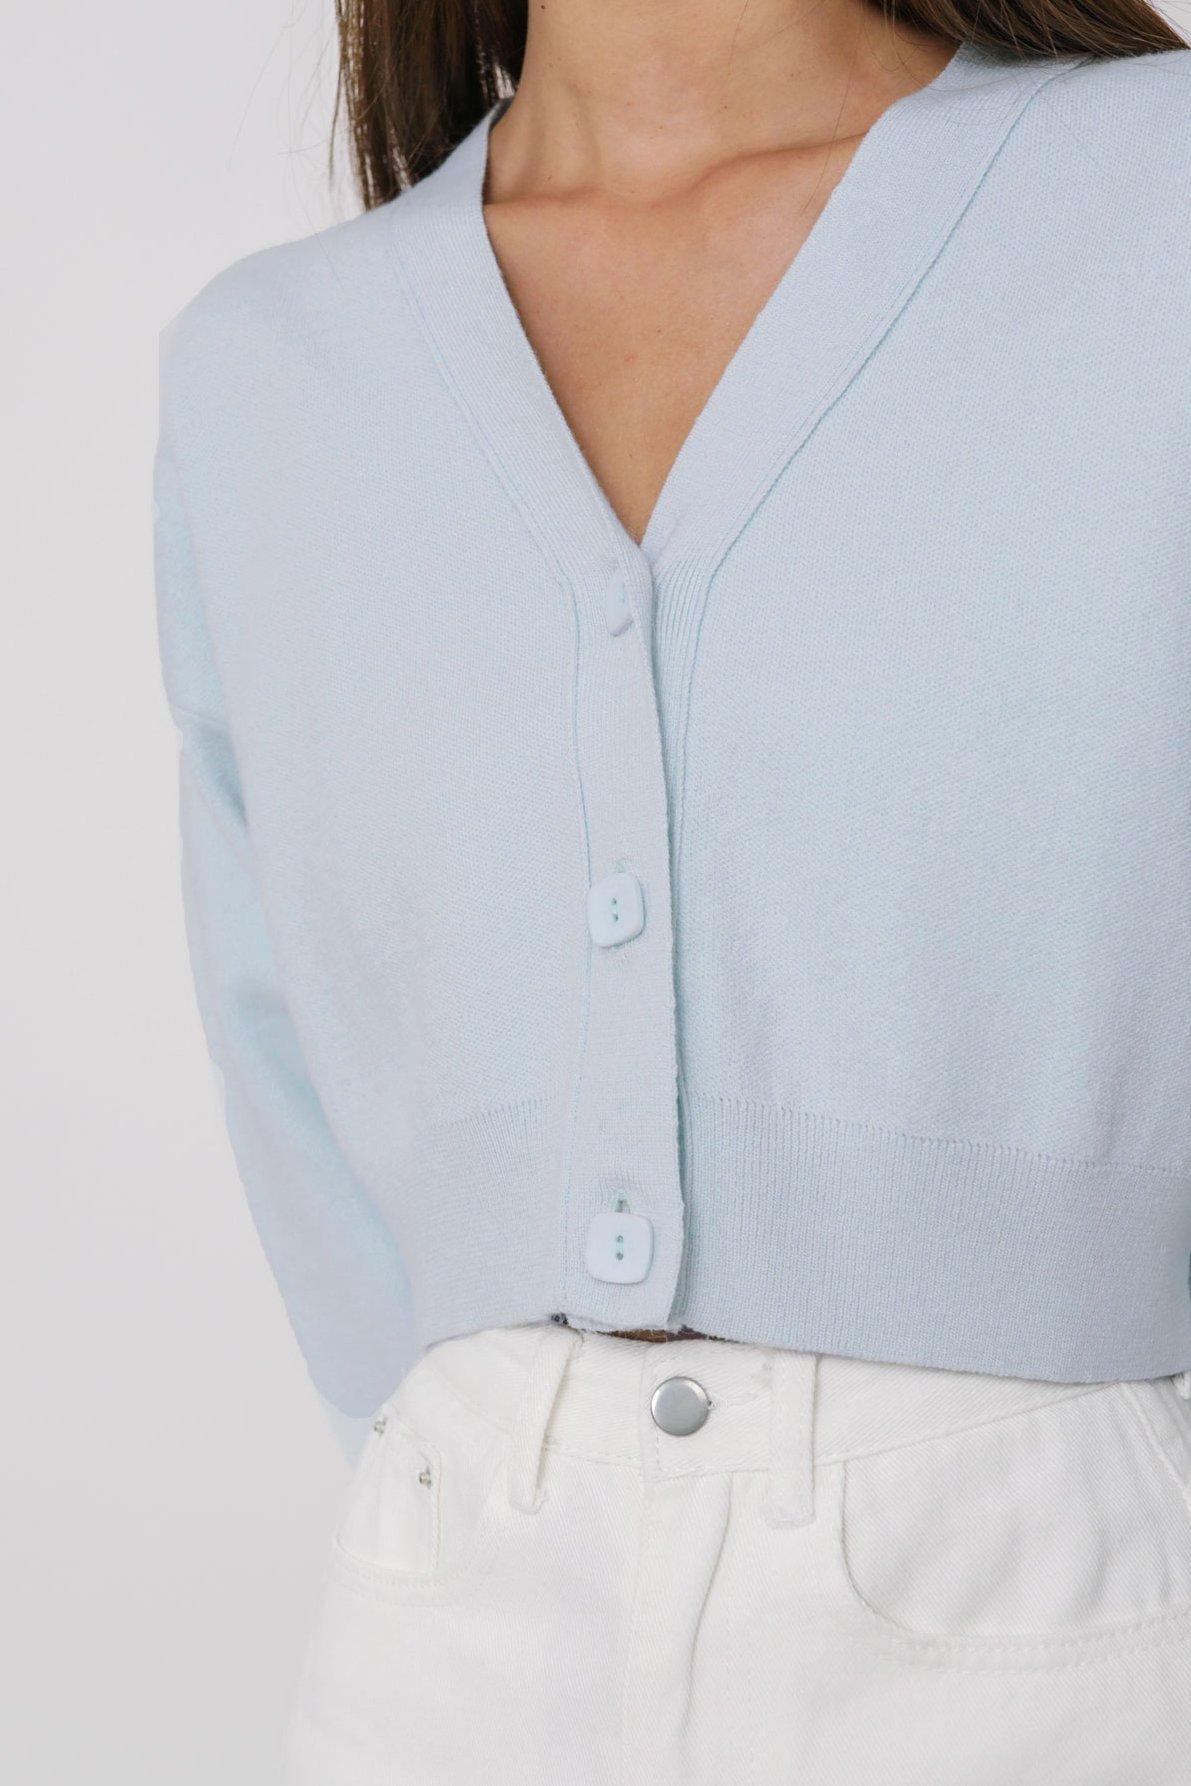 Euphoria Knit Cardigan (Baby Blue)